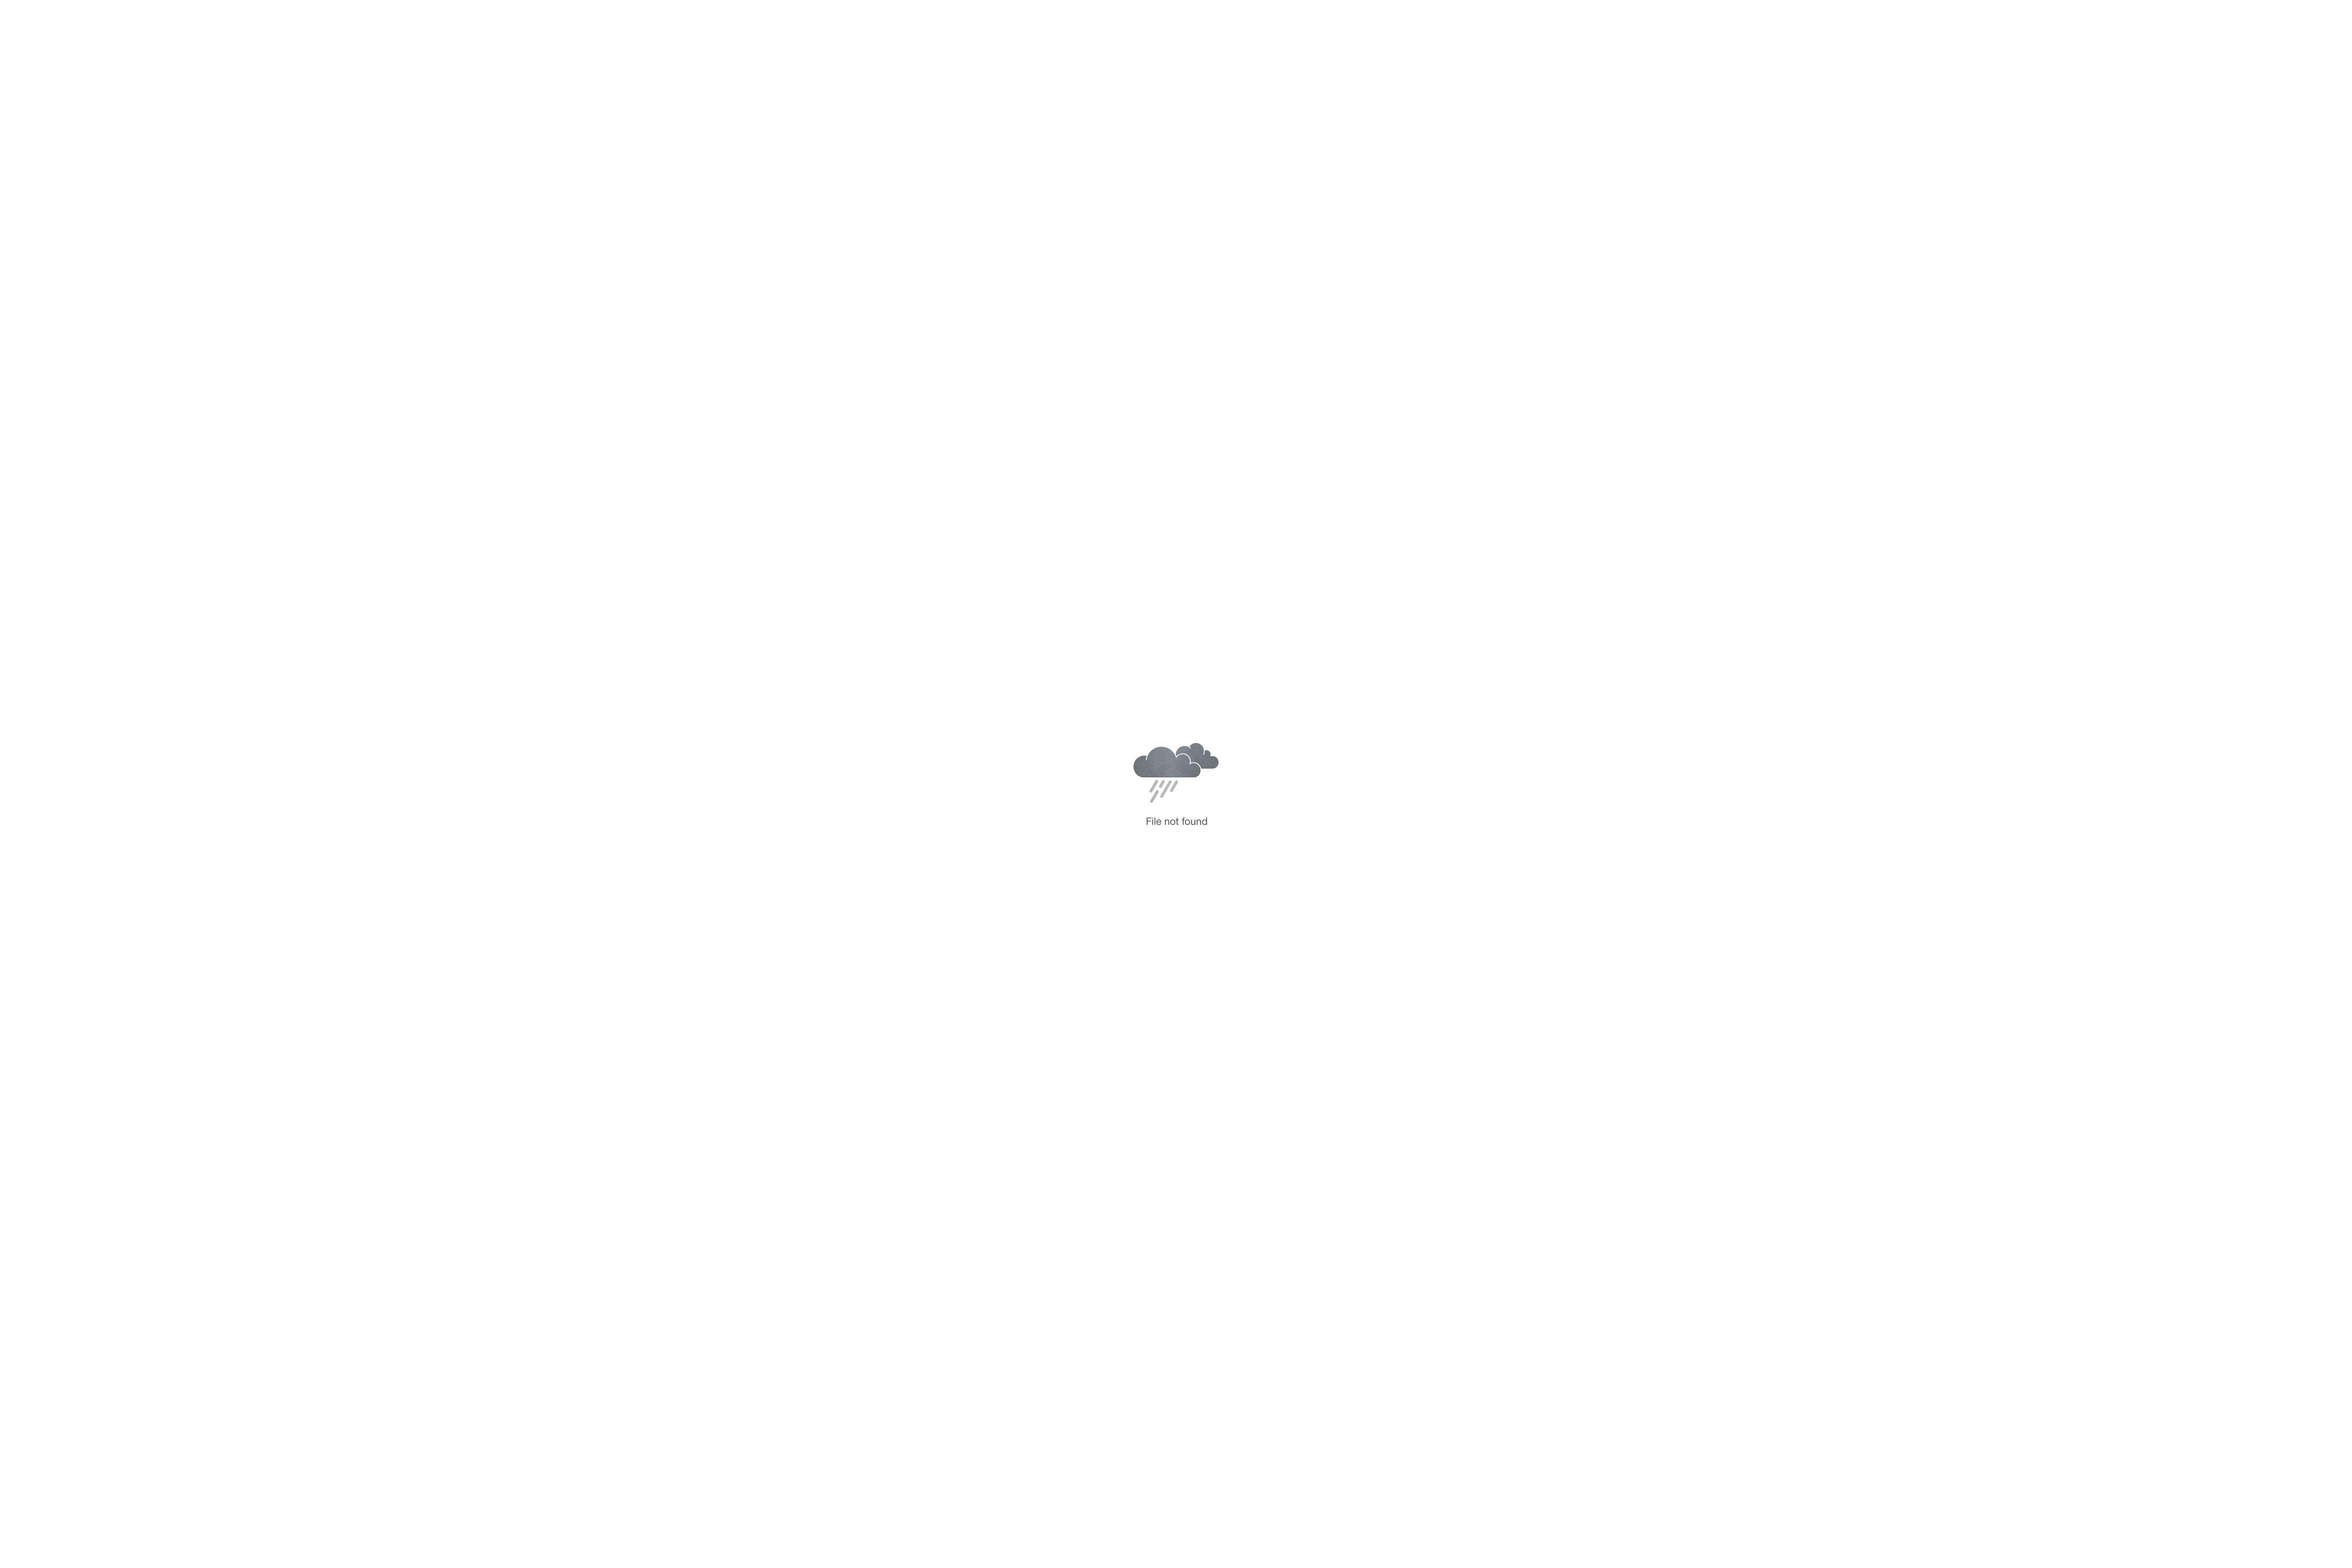 Association sportive-Lycée Romain Rolland Goussainville-Rugby-Sponsorise-me-image-4